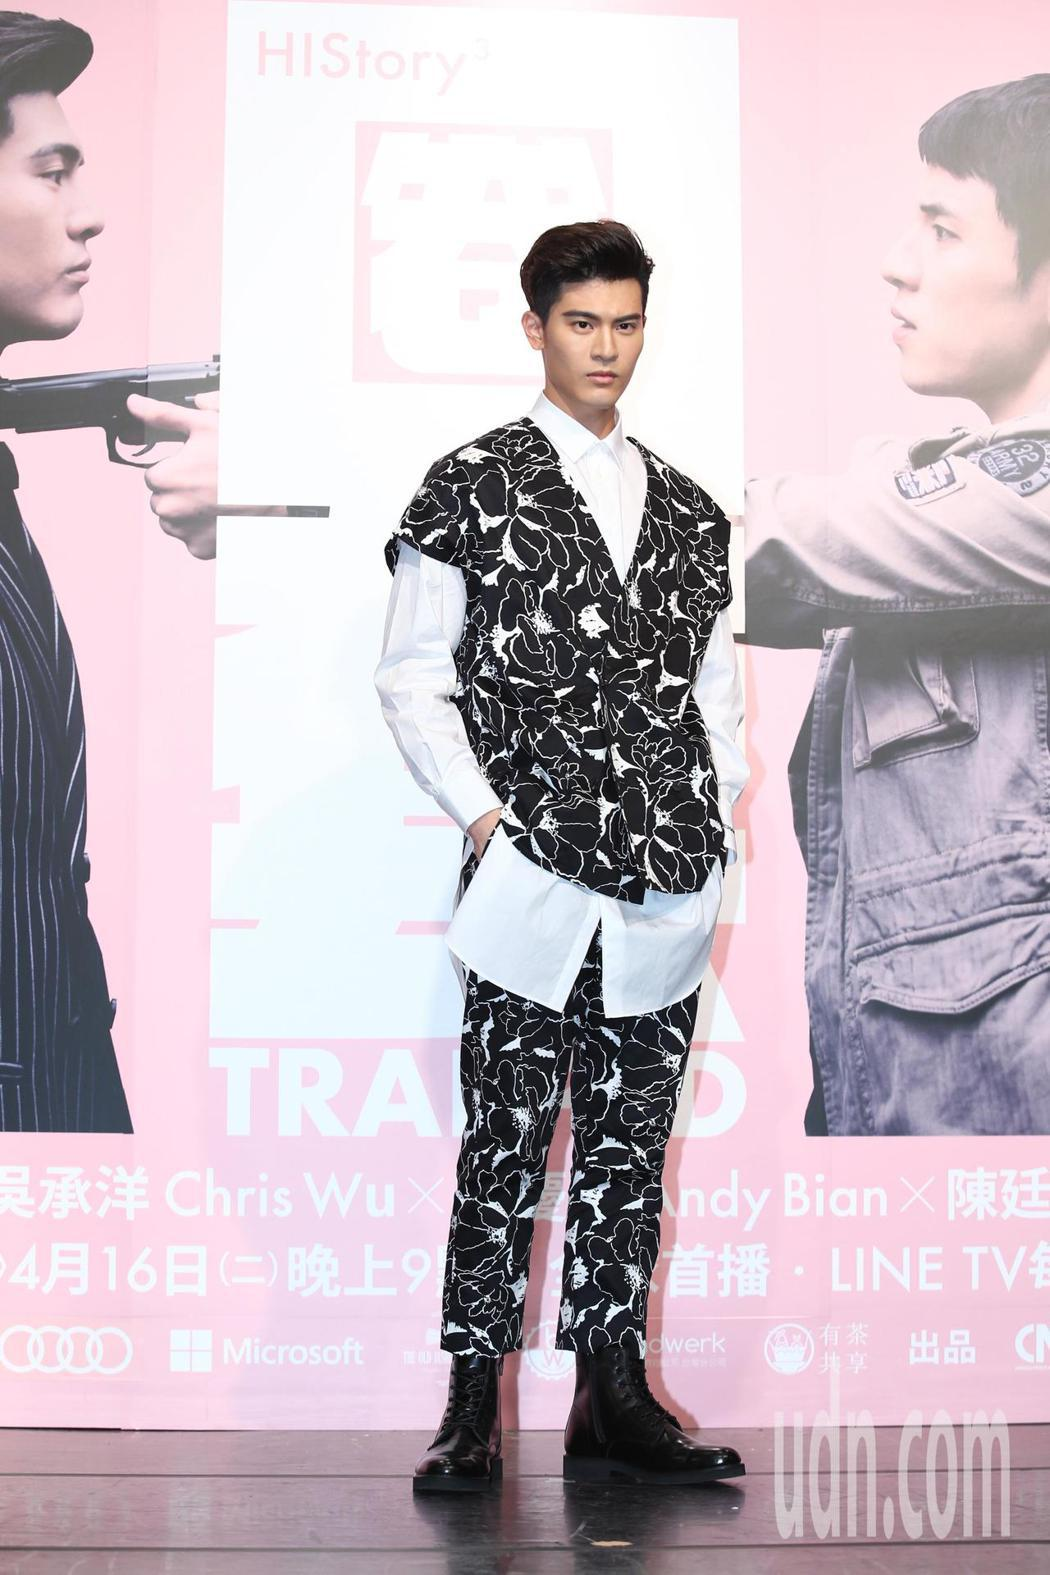 《HIStory3》新戲「圈套」舉行首映會,主要演員吳承洋出席宣傳。記者王騰毅/...